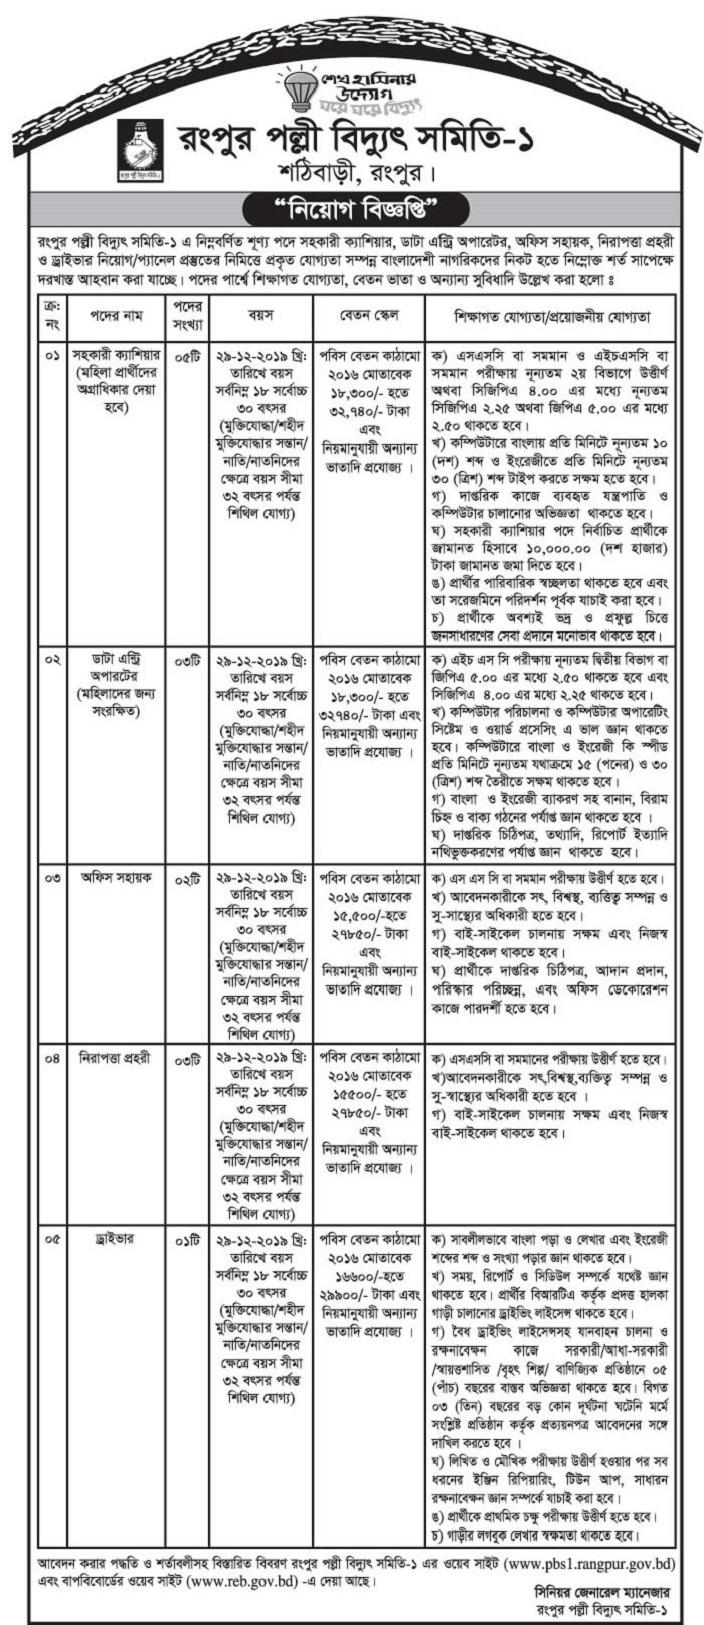 Rangpur Palli Bidyut Samity Job Circular 2020